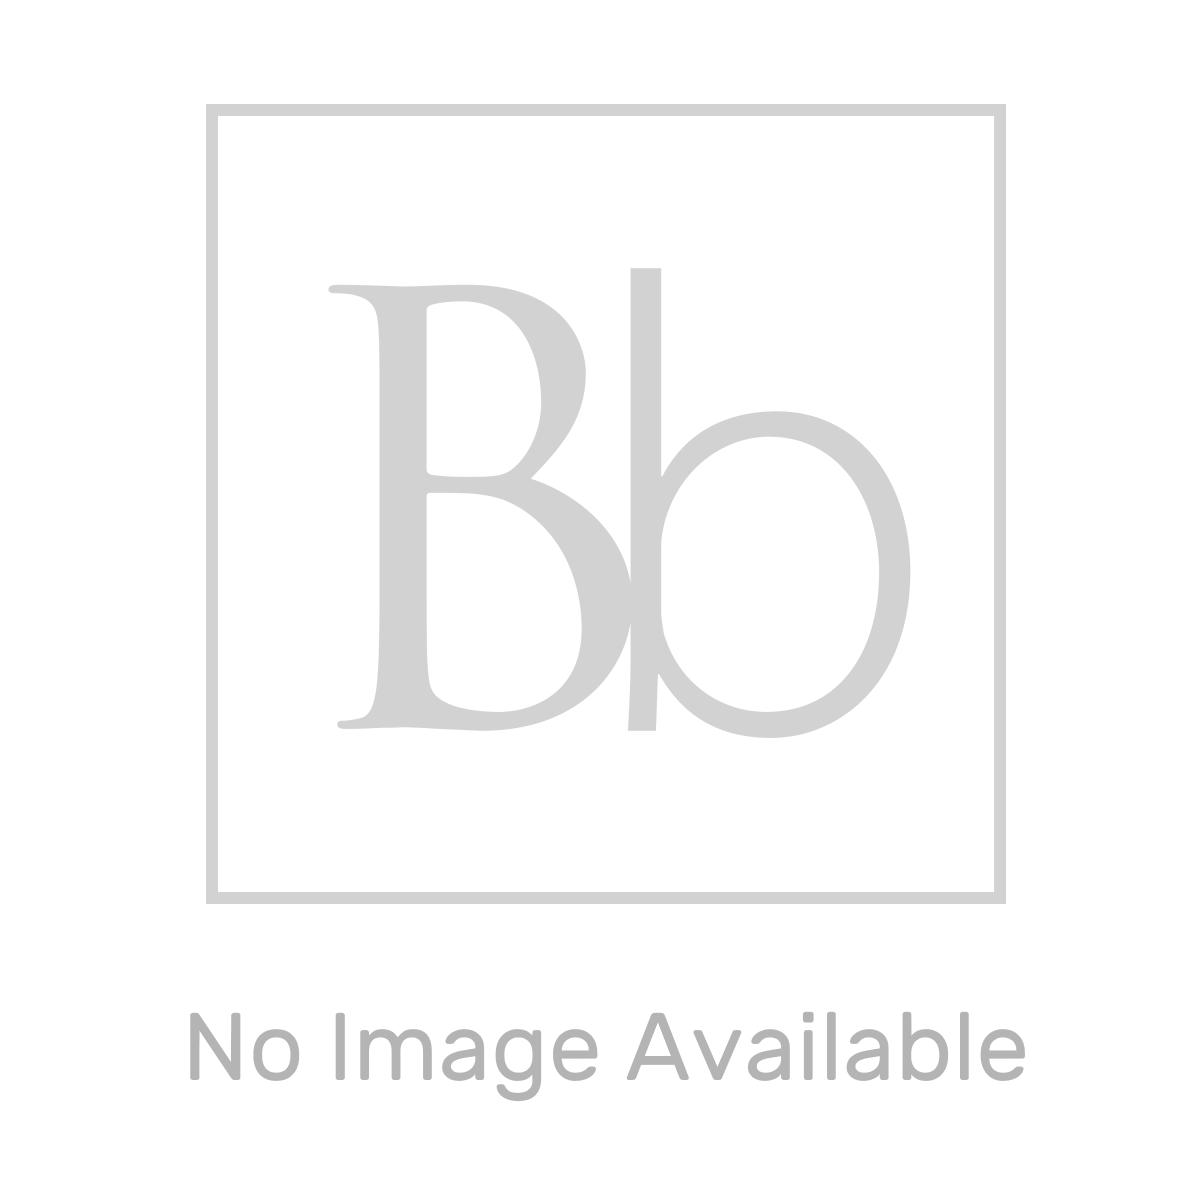 Aquadart Black Slate Shower Tray 1100 x 900